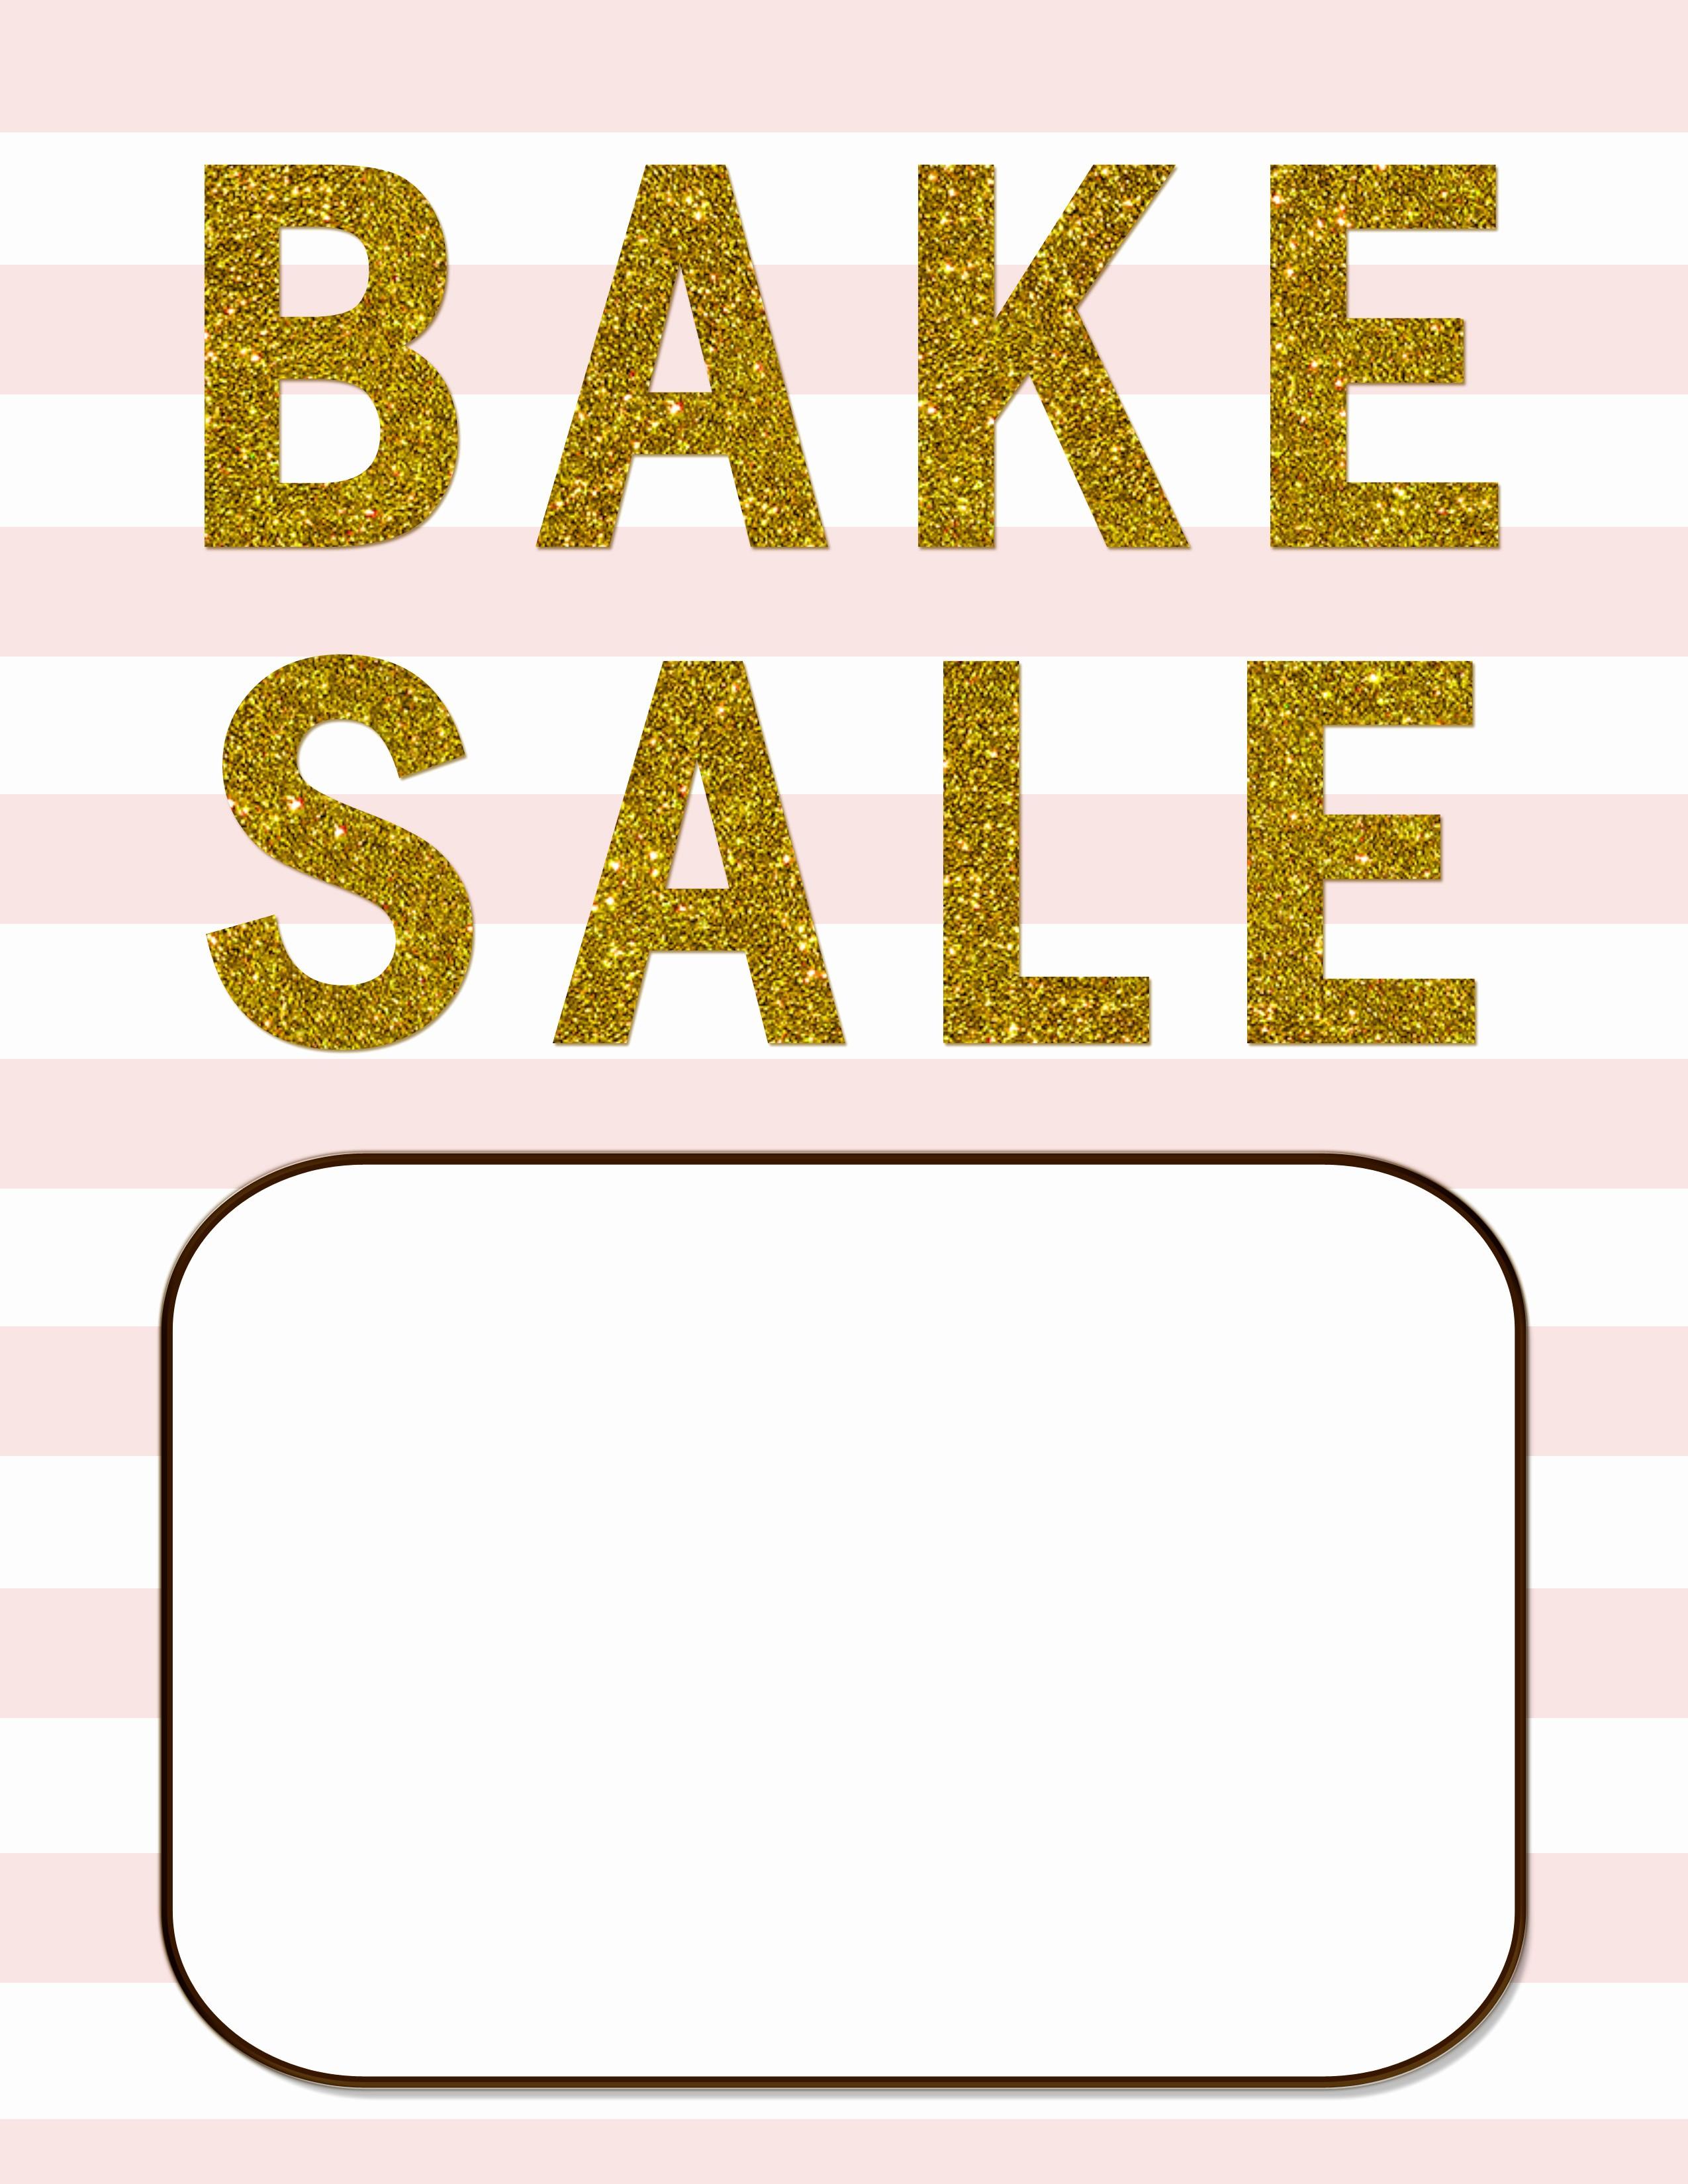 Bake Sale Template Microsoft Word Fresh Best S Of Bake Sale Template Microsoft Word Free